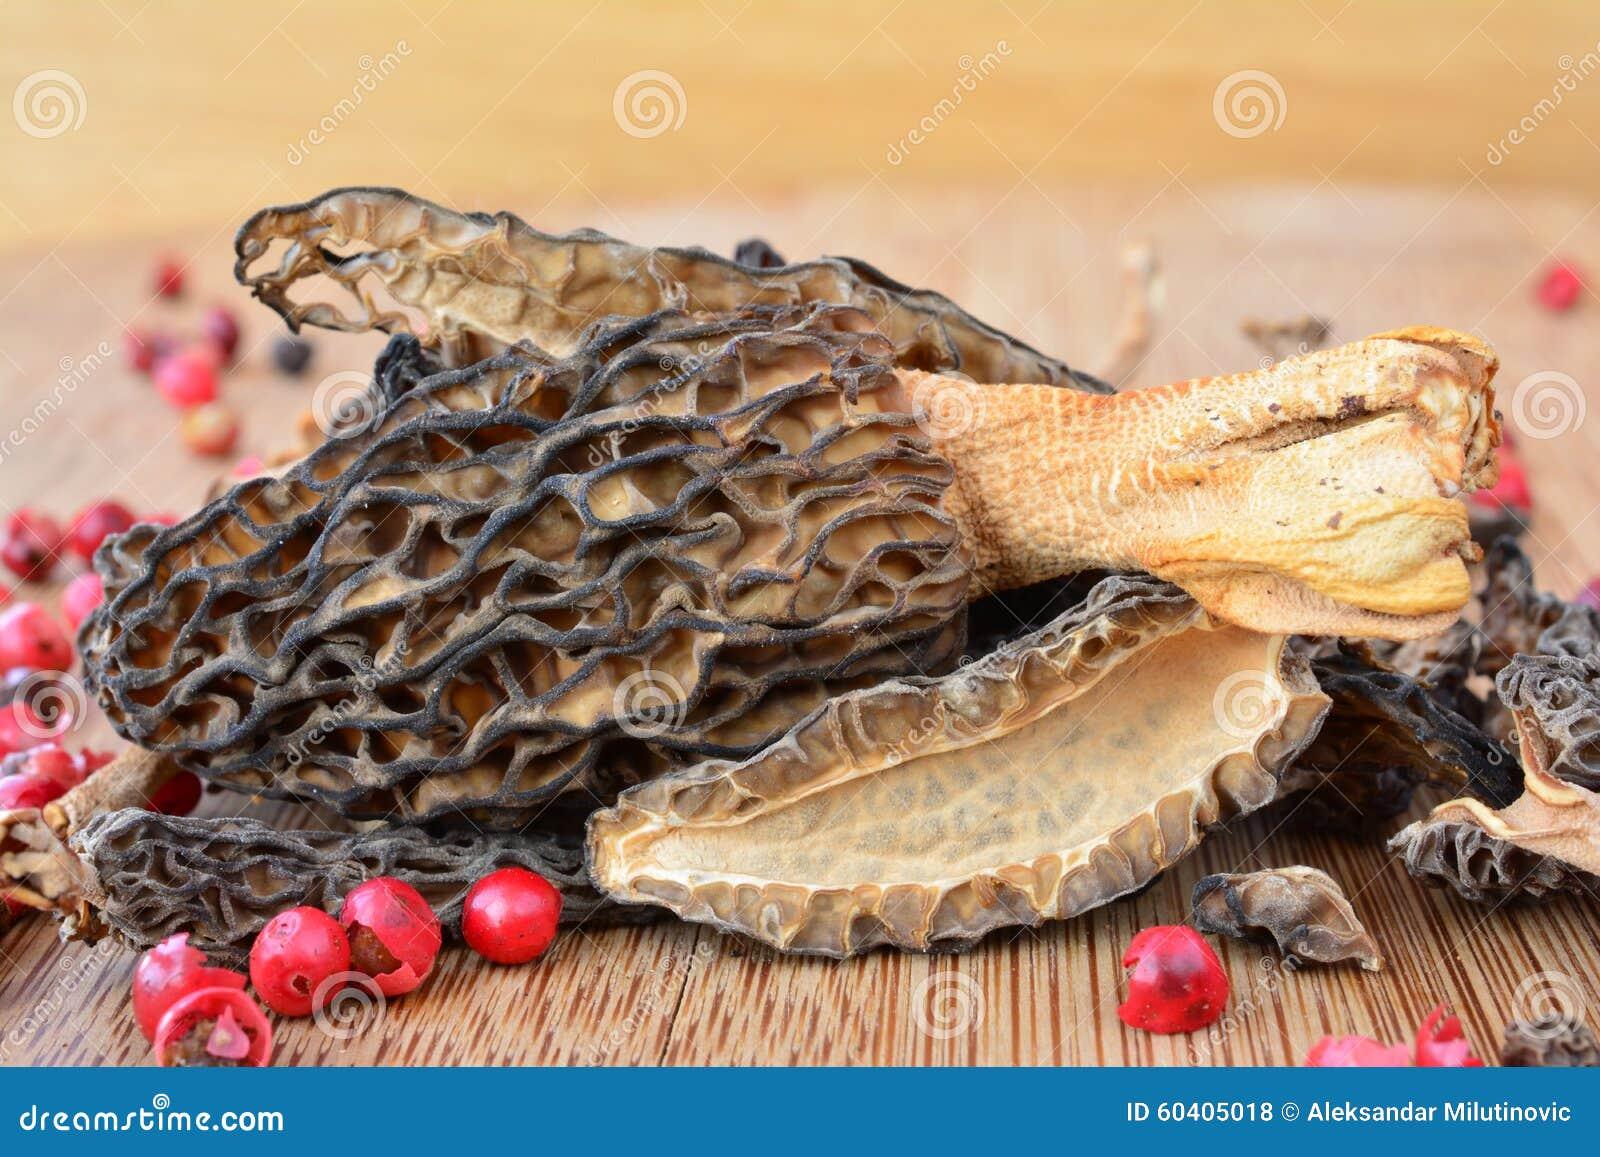 Dried Morels close up